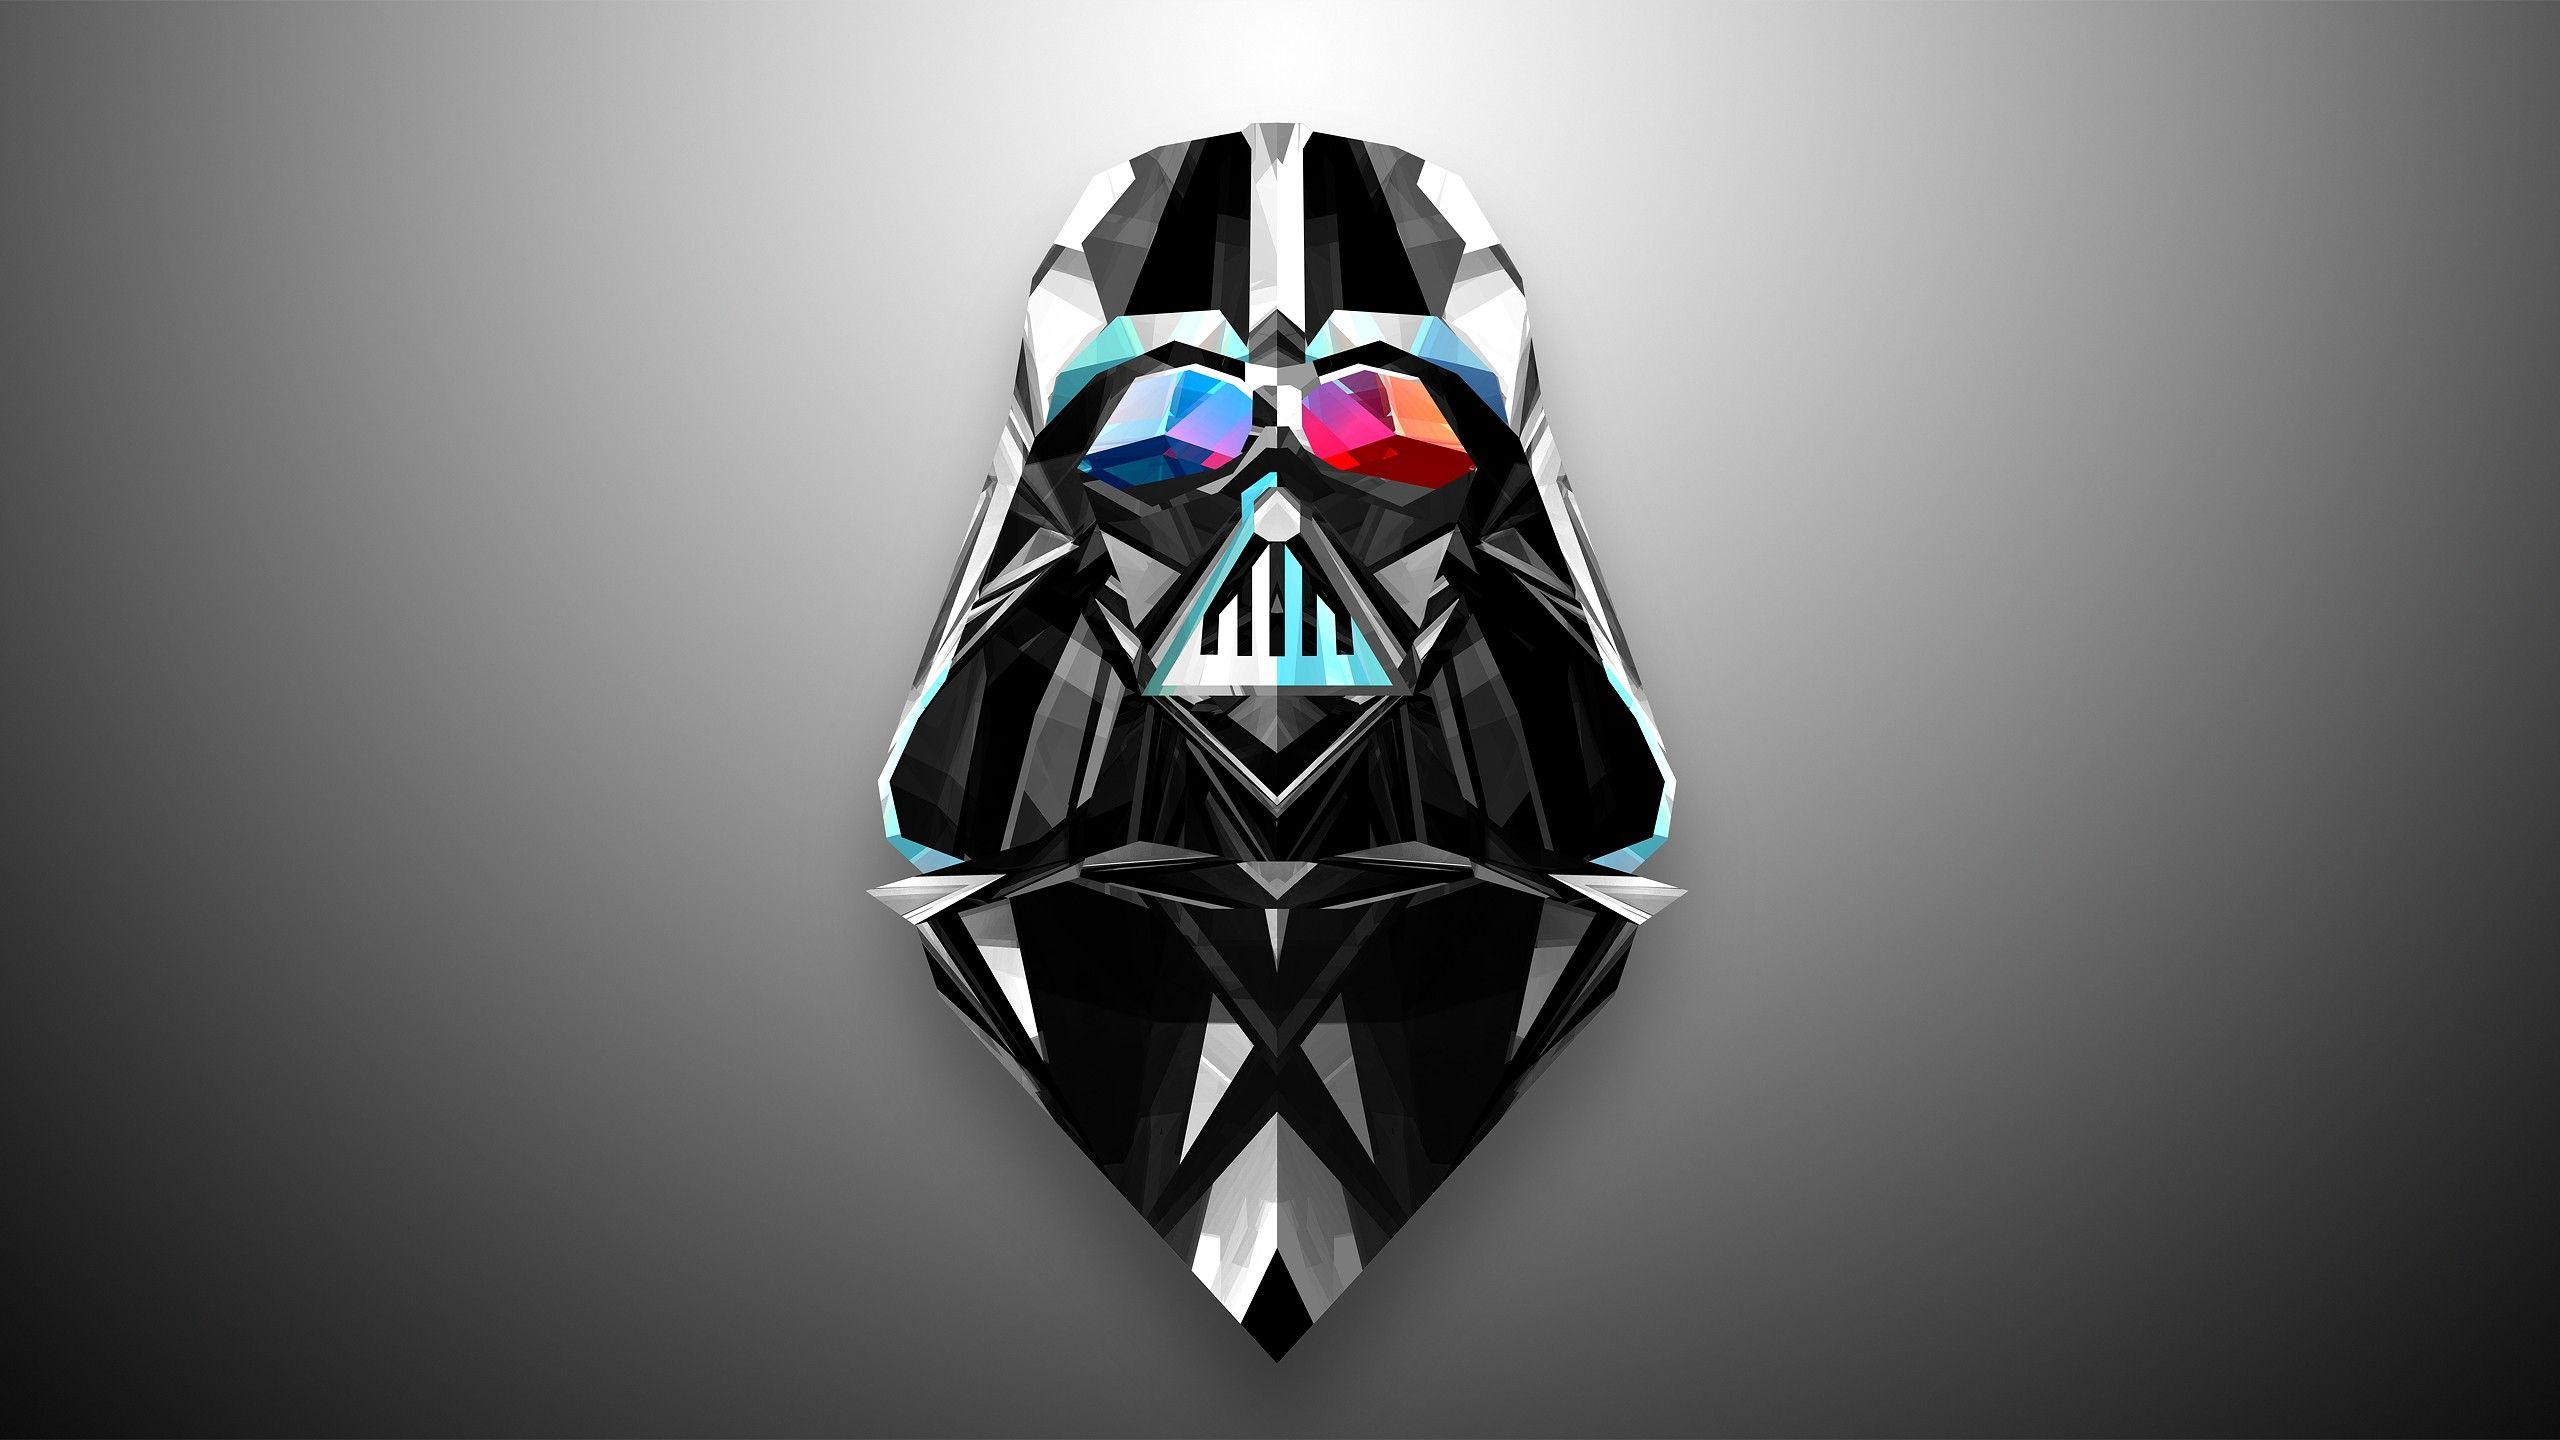 249 Darth Vader Papéis De Parede HD